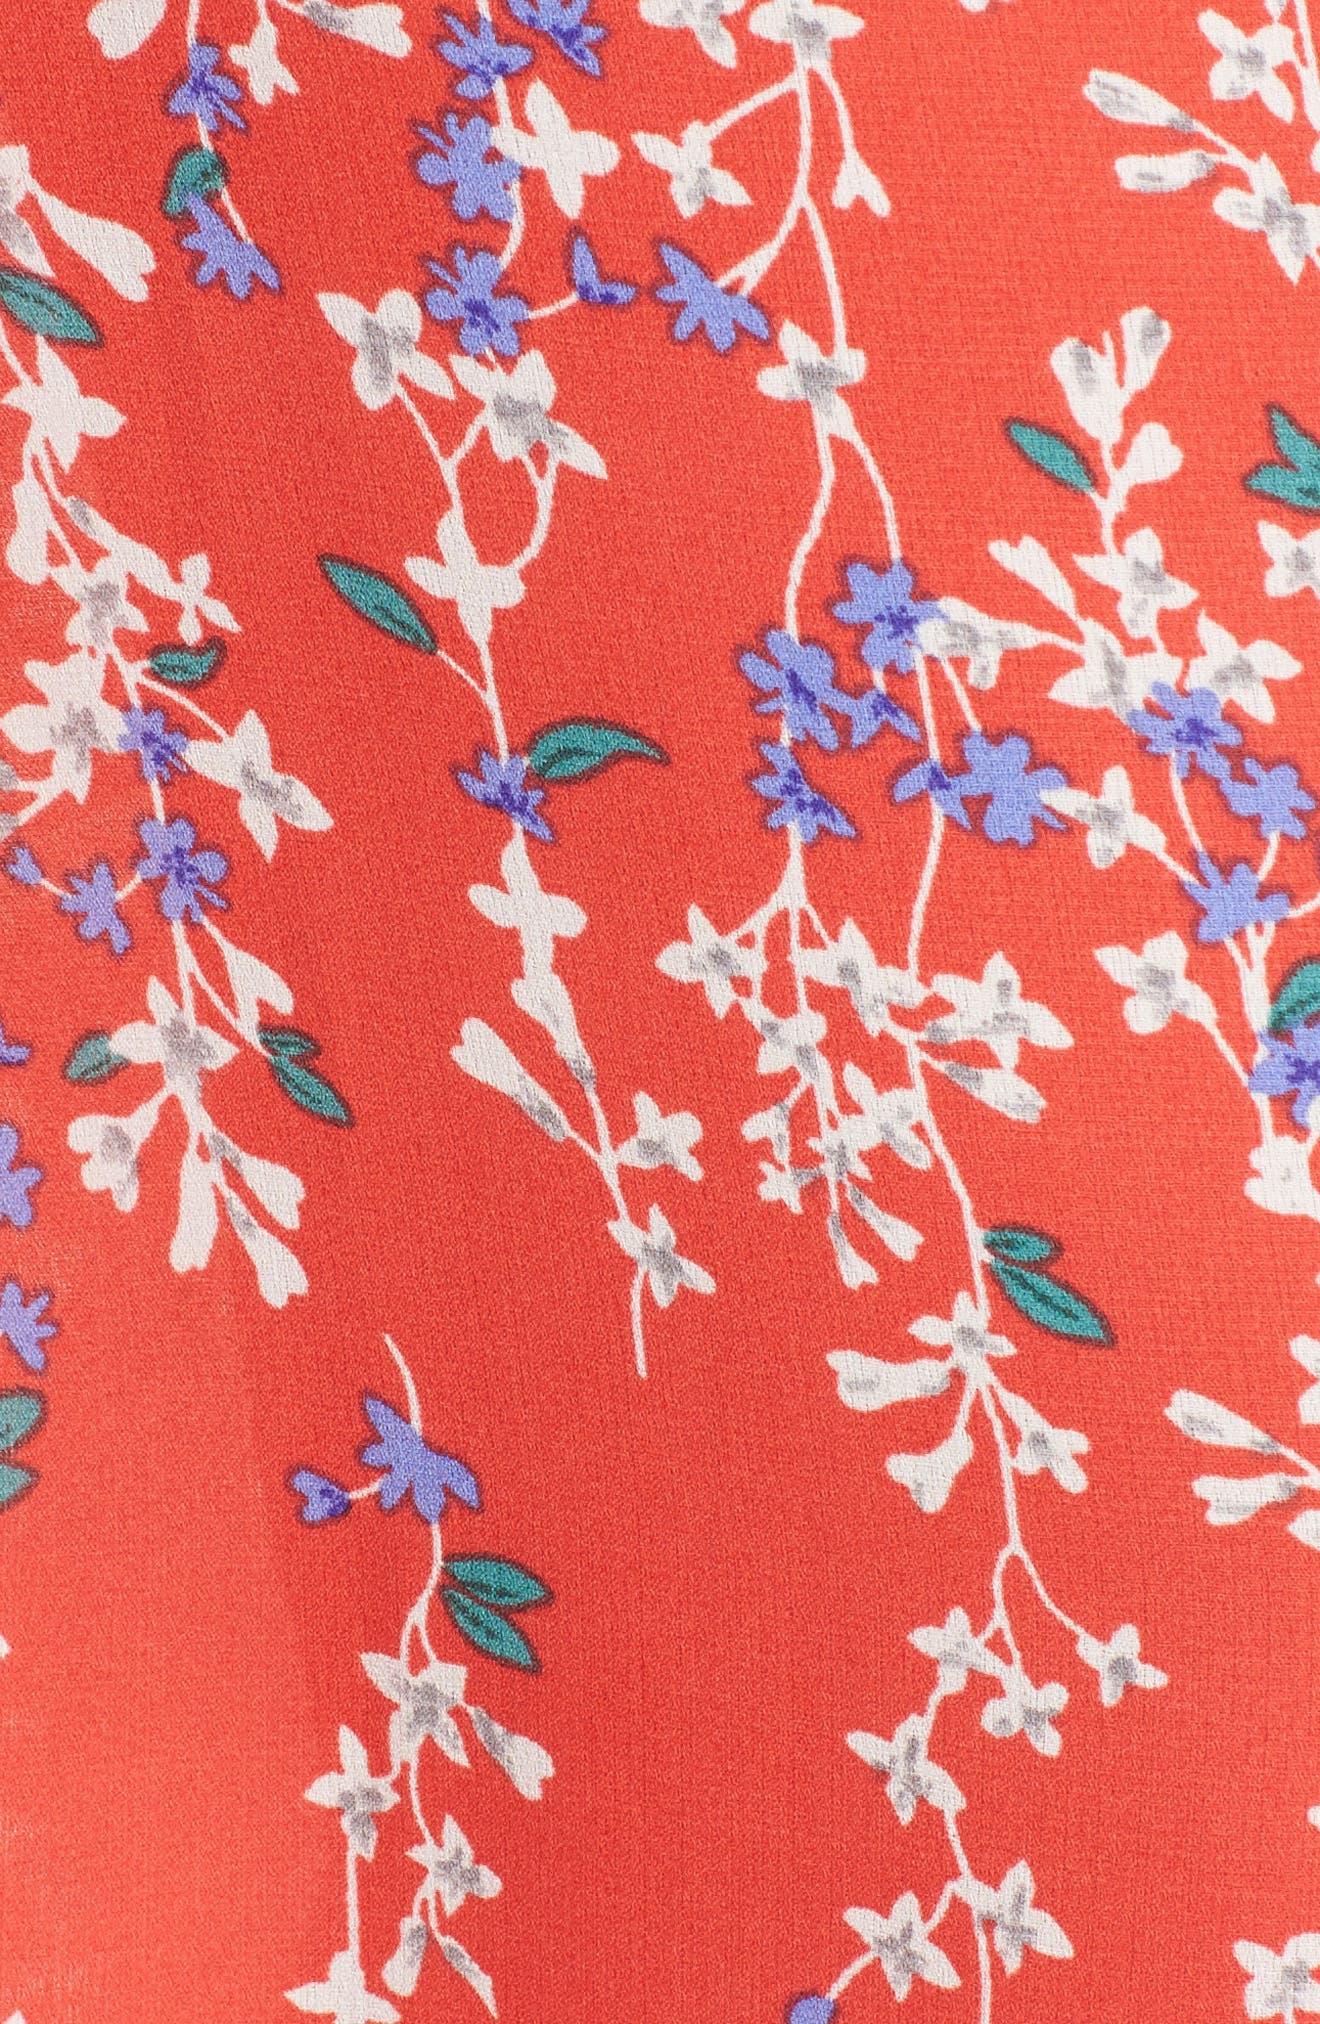 Floral Open Back Jumpsuit,                             Alternate thumbnail 5, color,                             RED MULTI